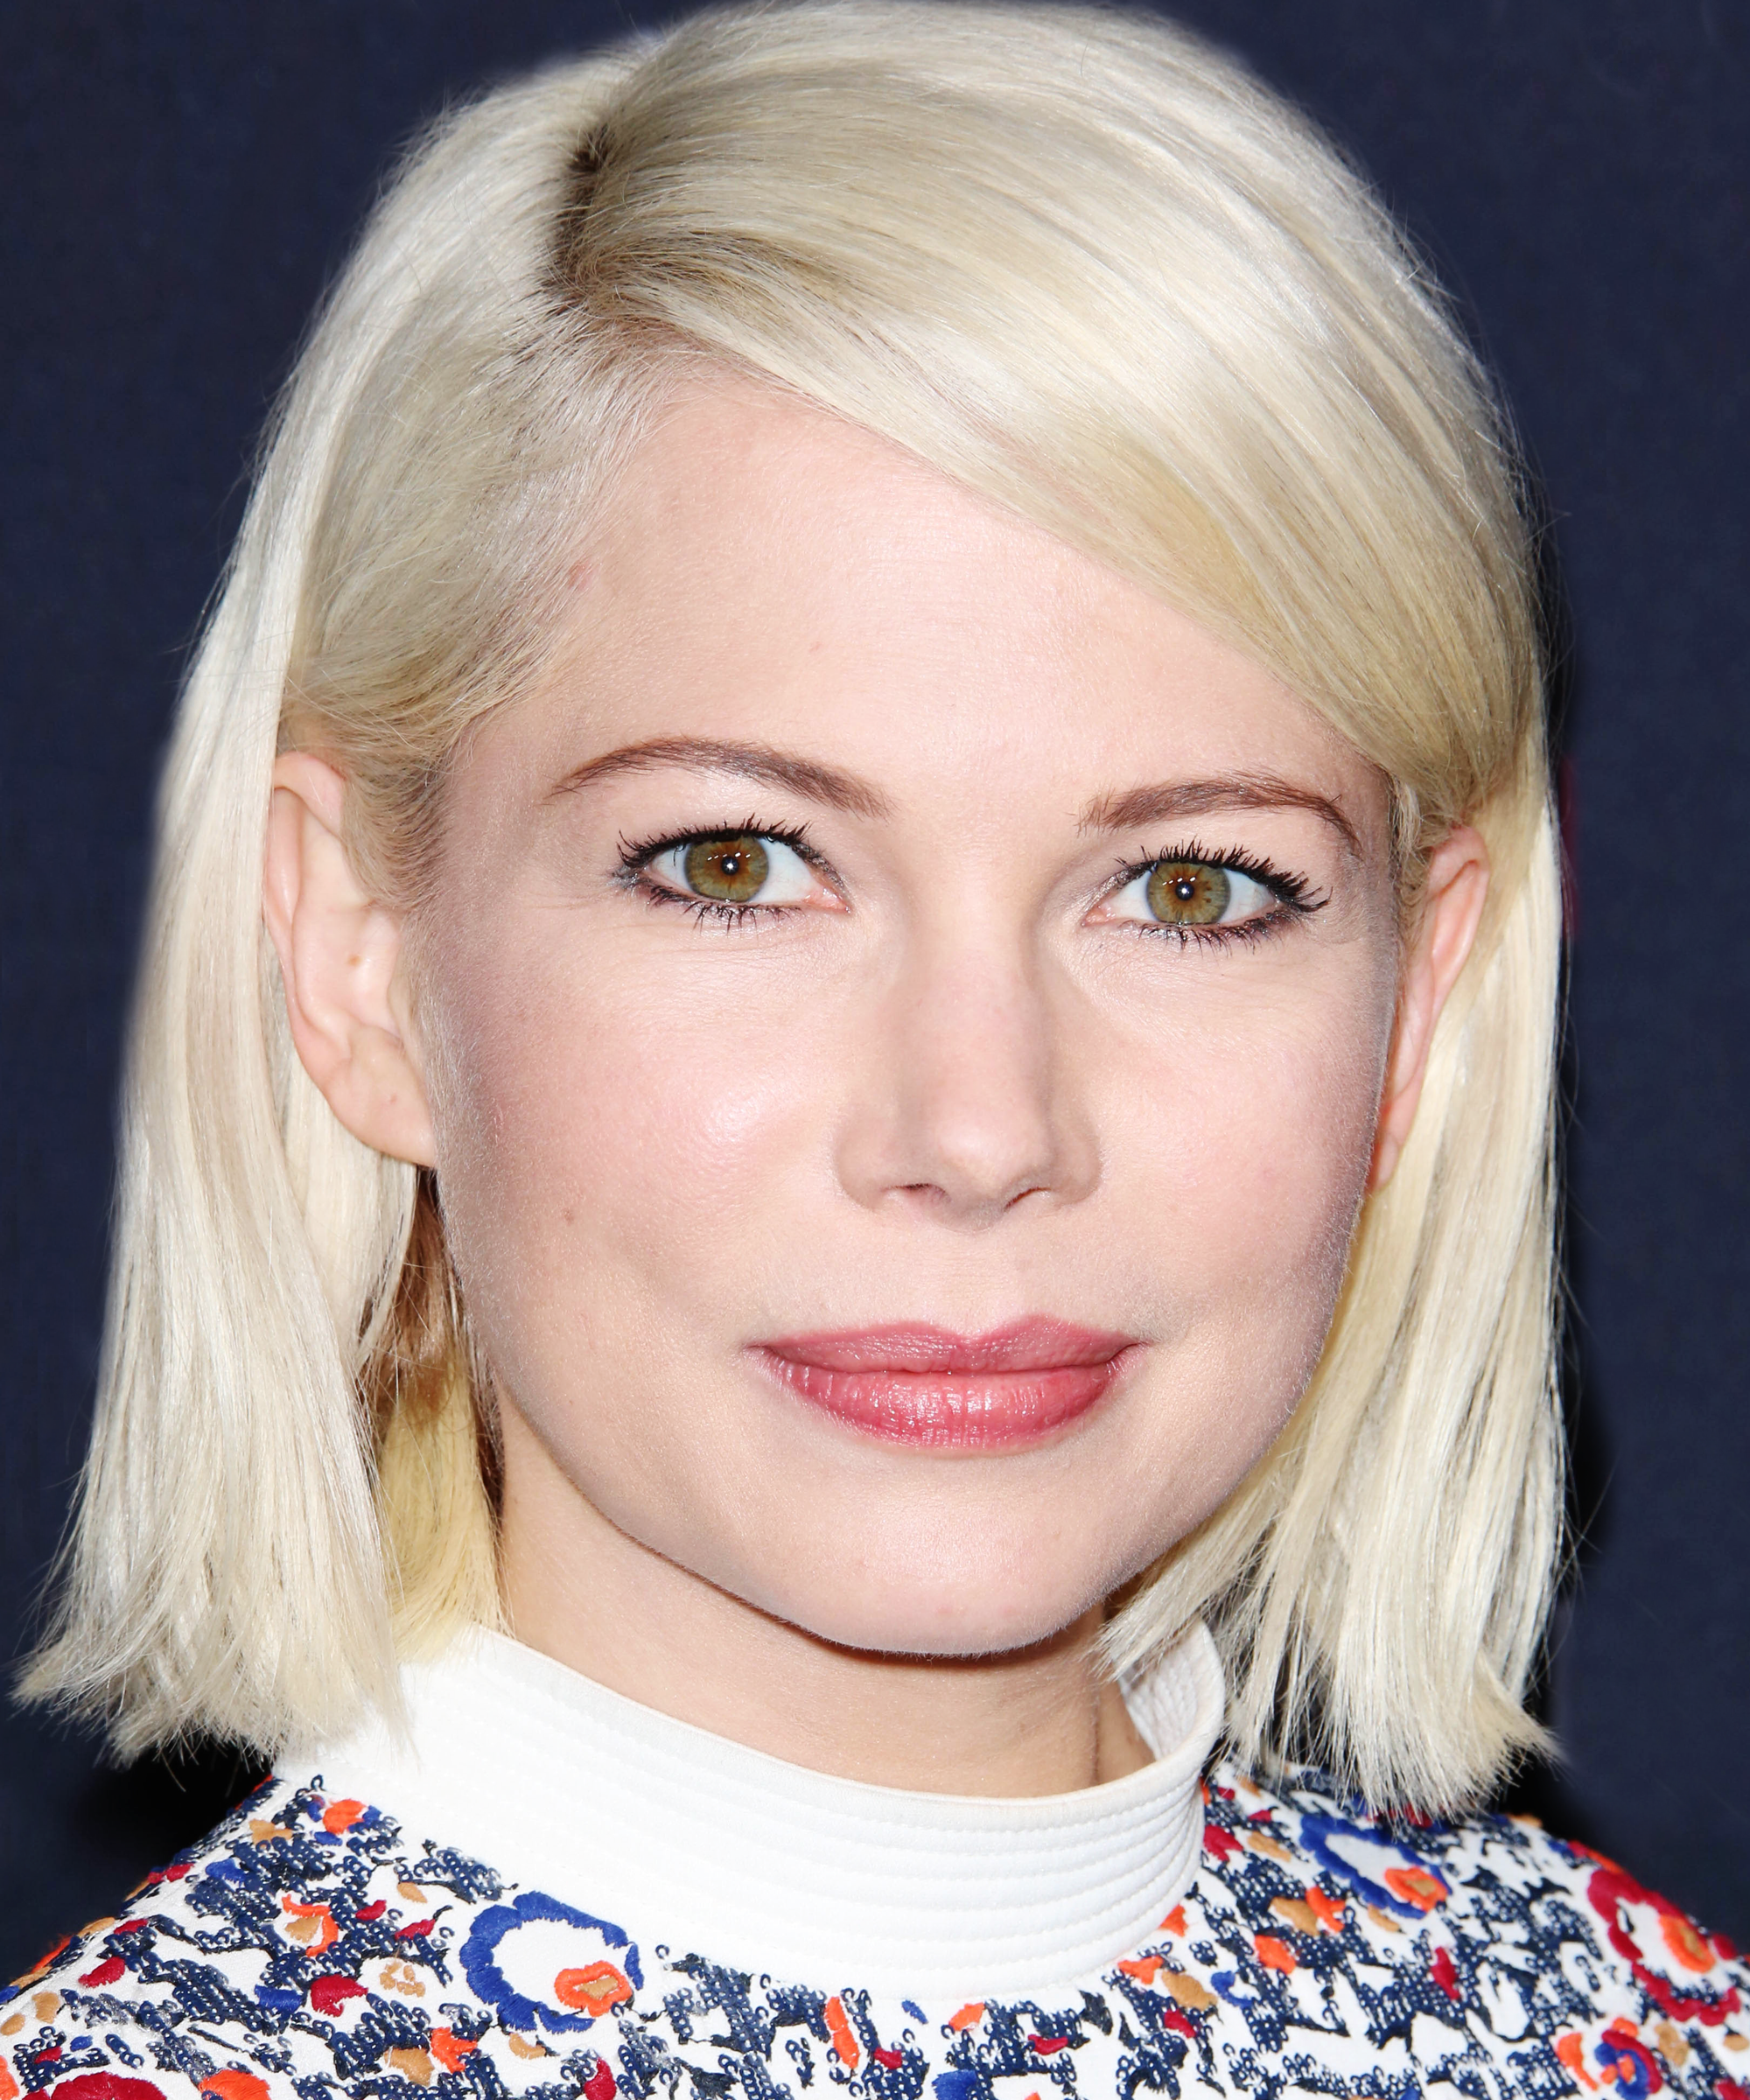 Blonde hair pale green eyes - Blonde Hair Pale Green Eyes 45